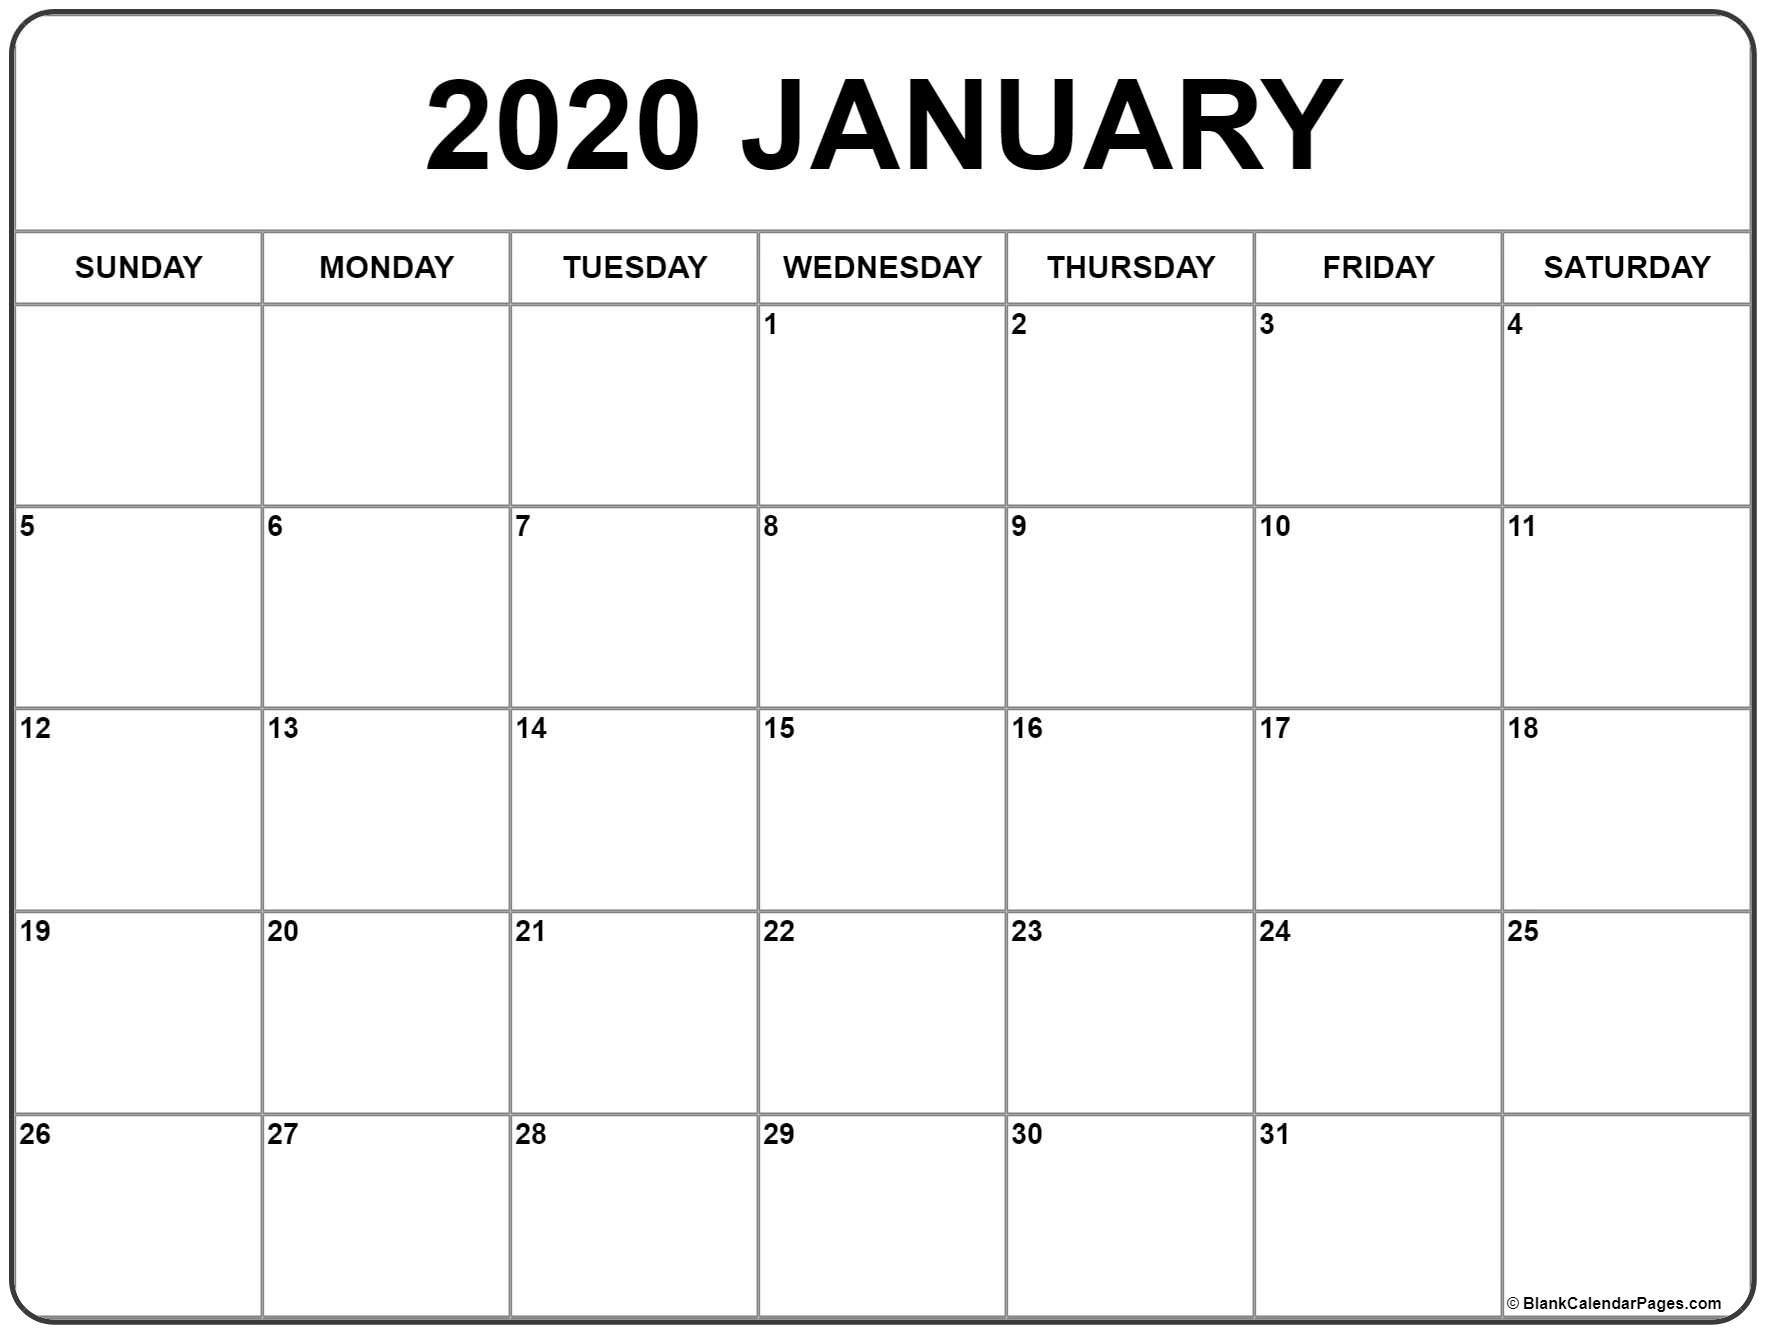 January 2020 Calendar | Free Printable Monthly Calendars 2020 Monthly Calendar Template Word